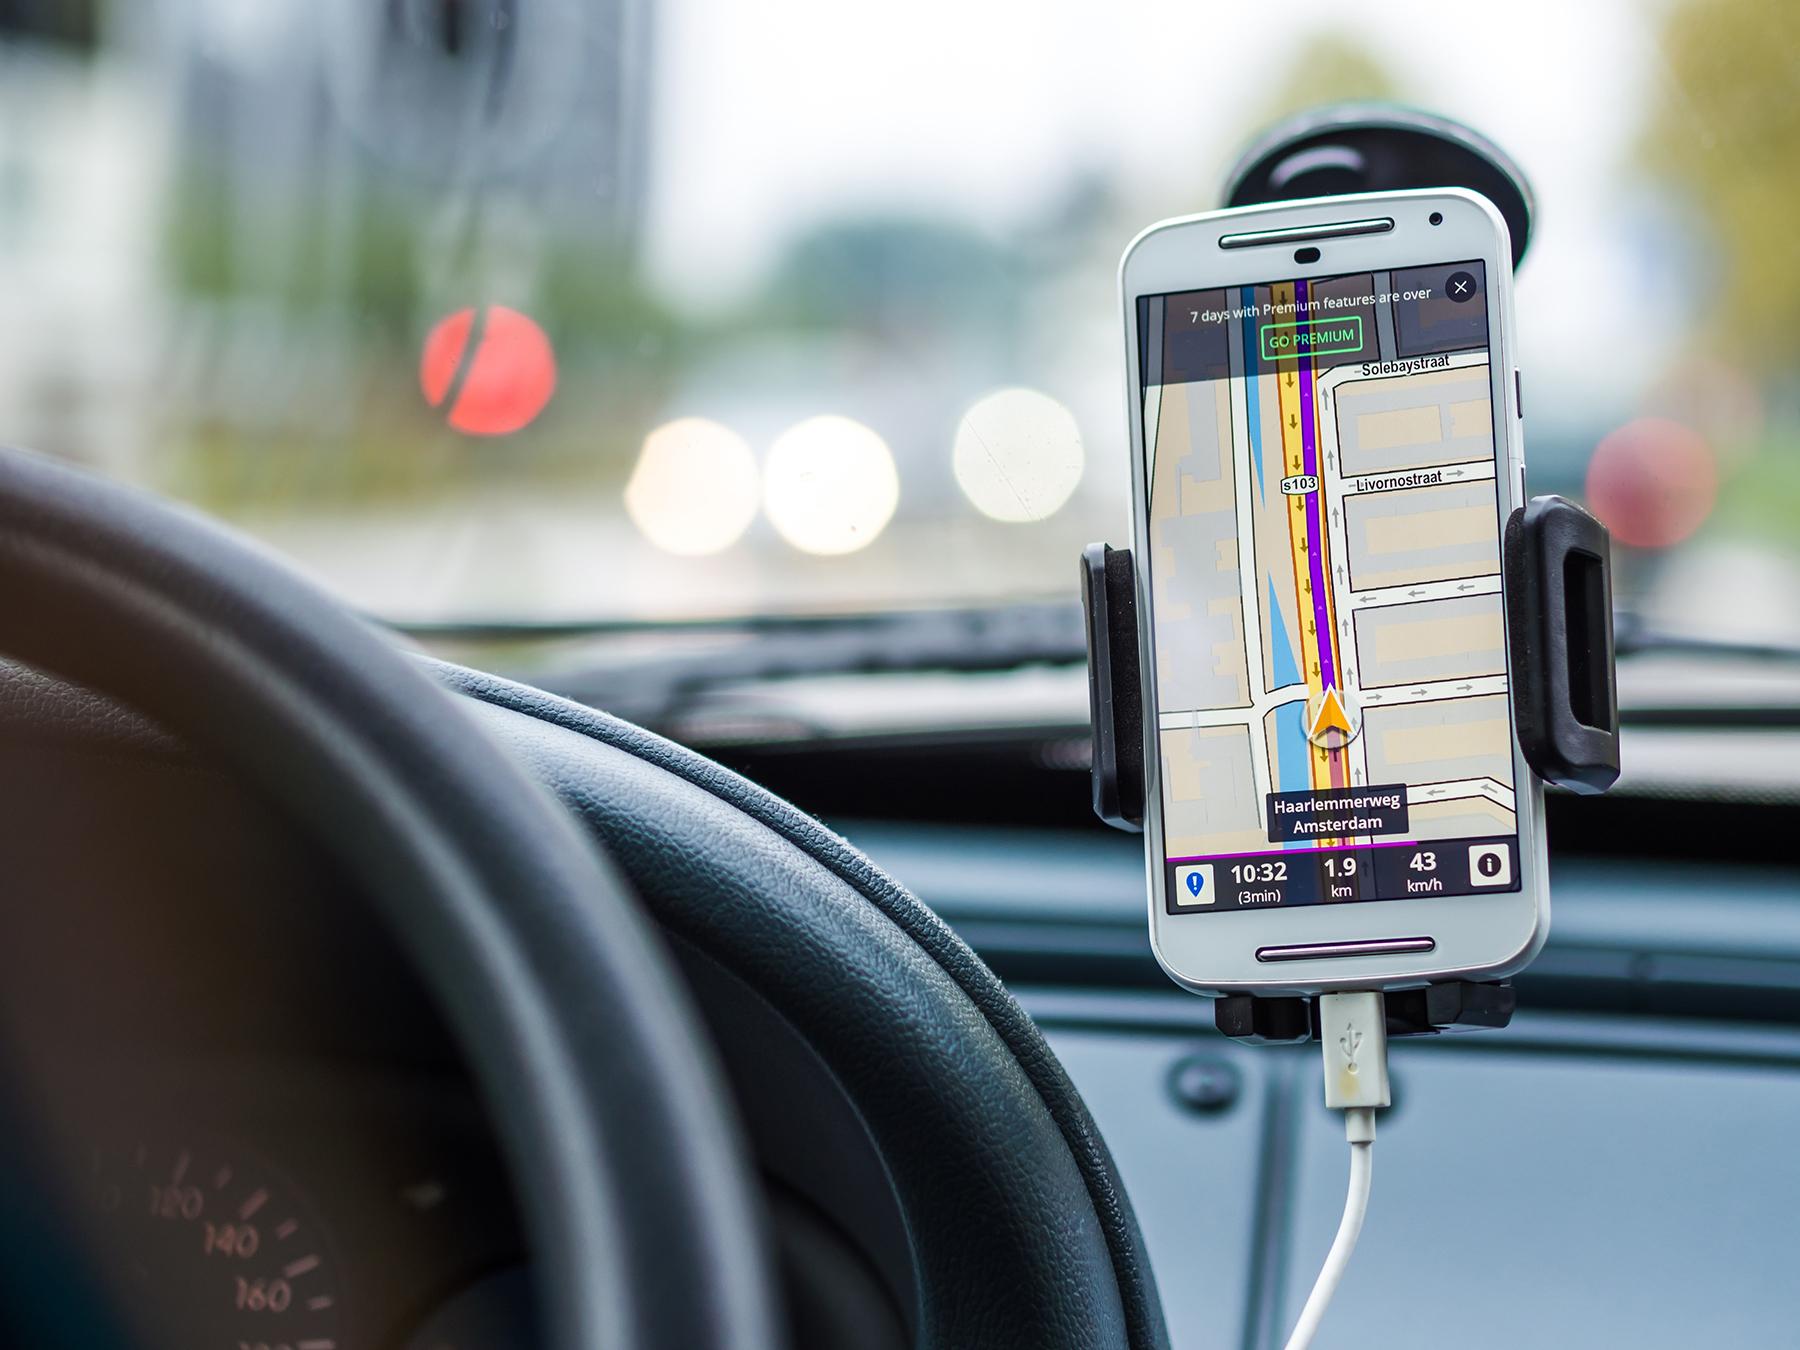 uber and lyft navigation